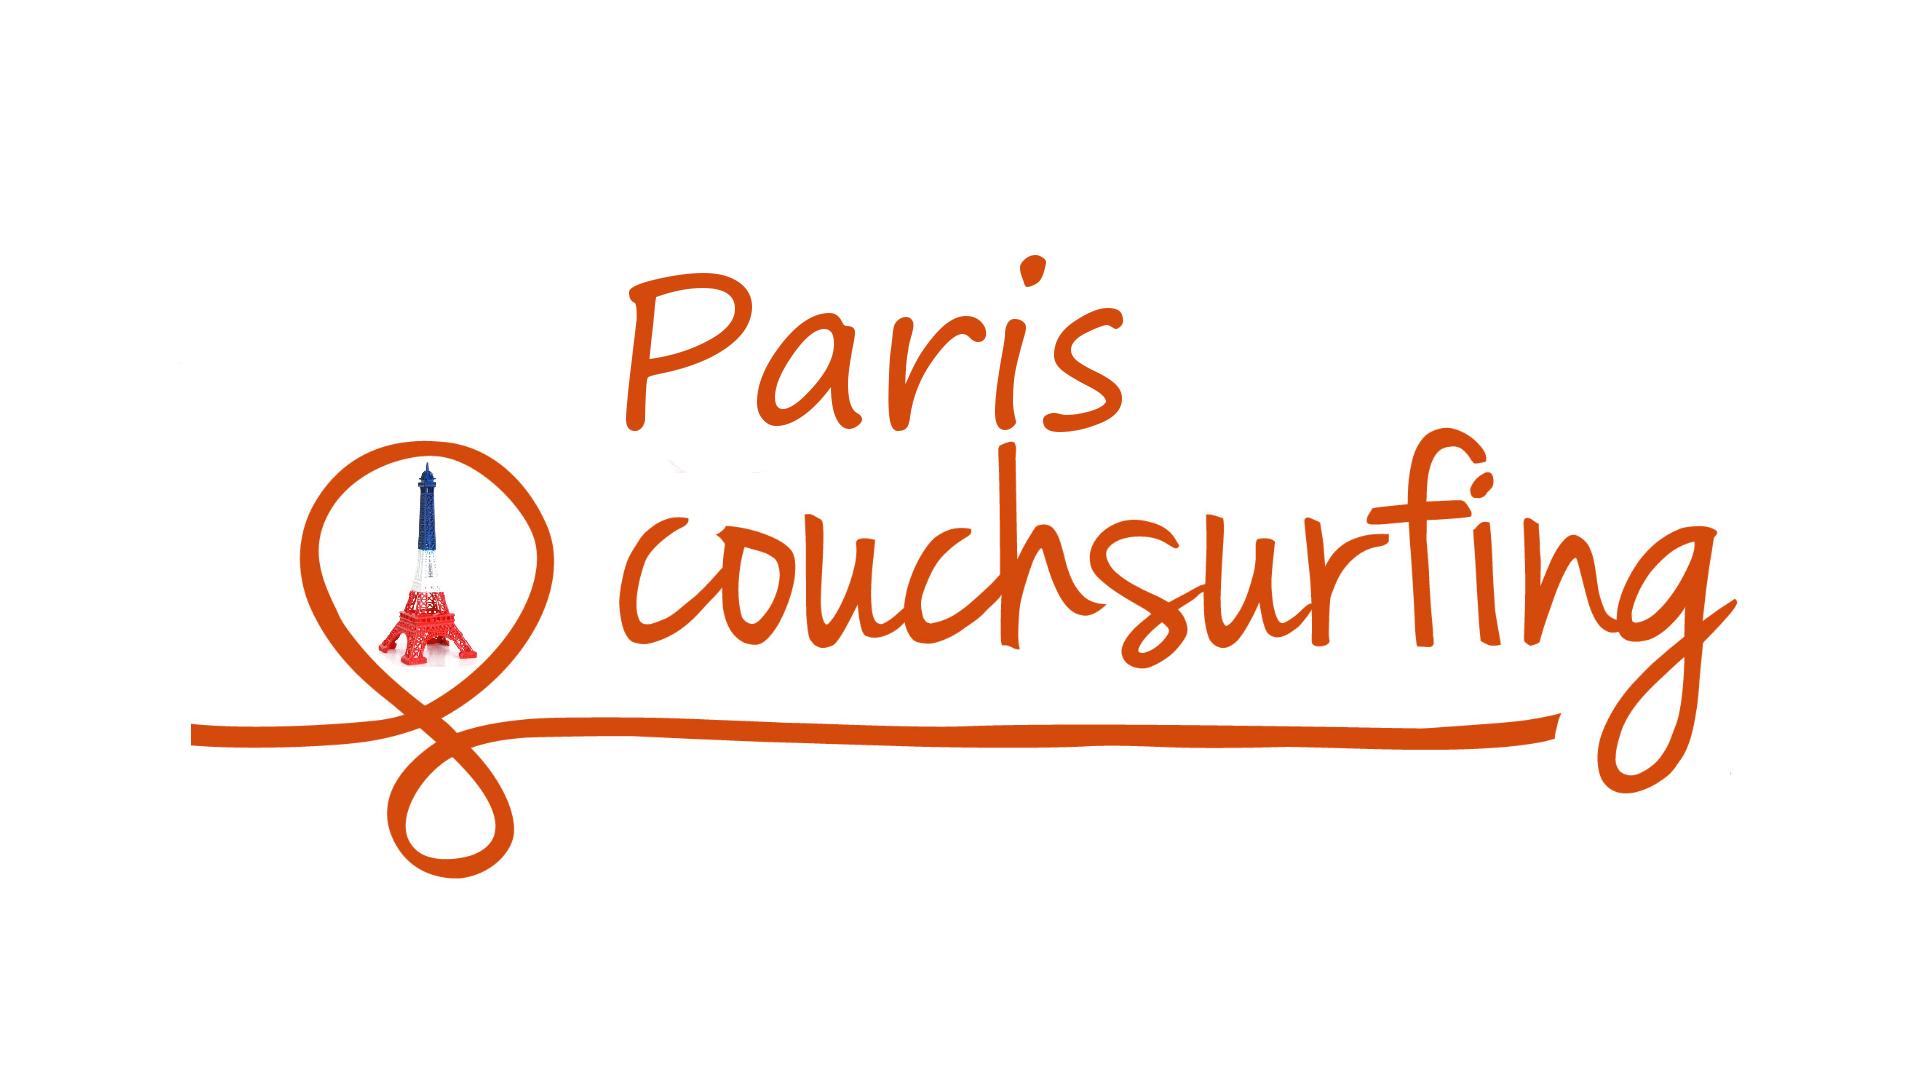 Music Quiz Couchsurfing Apero 16 Oct 2018